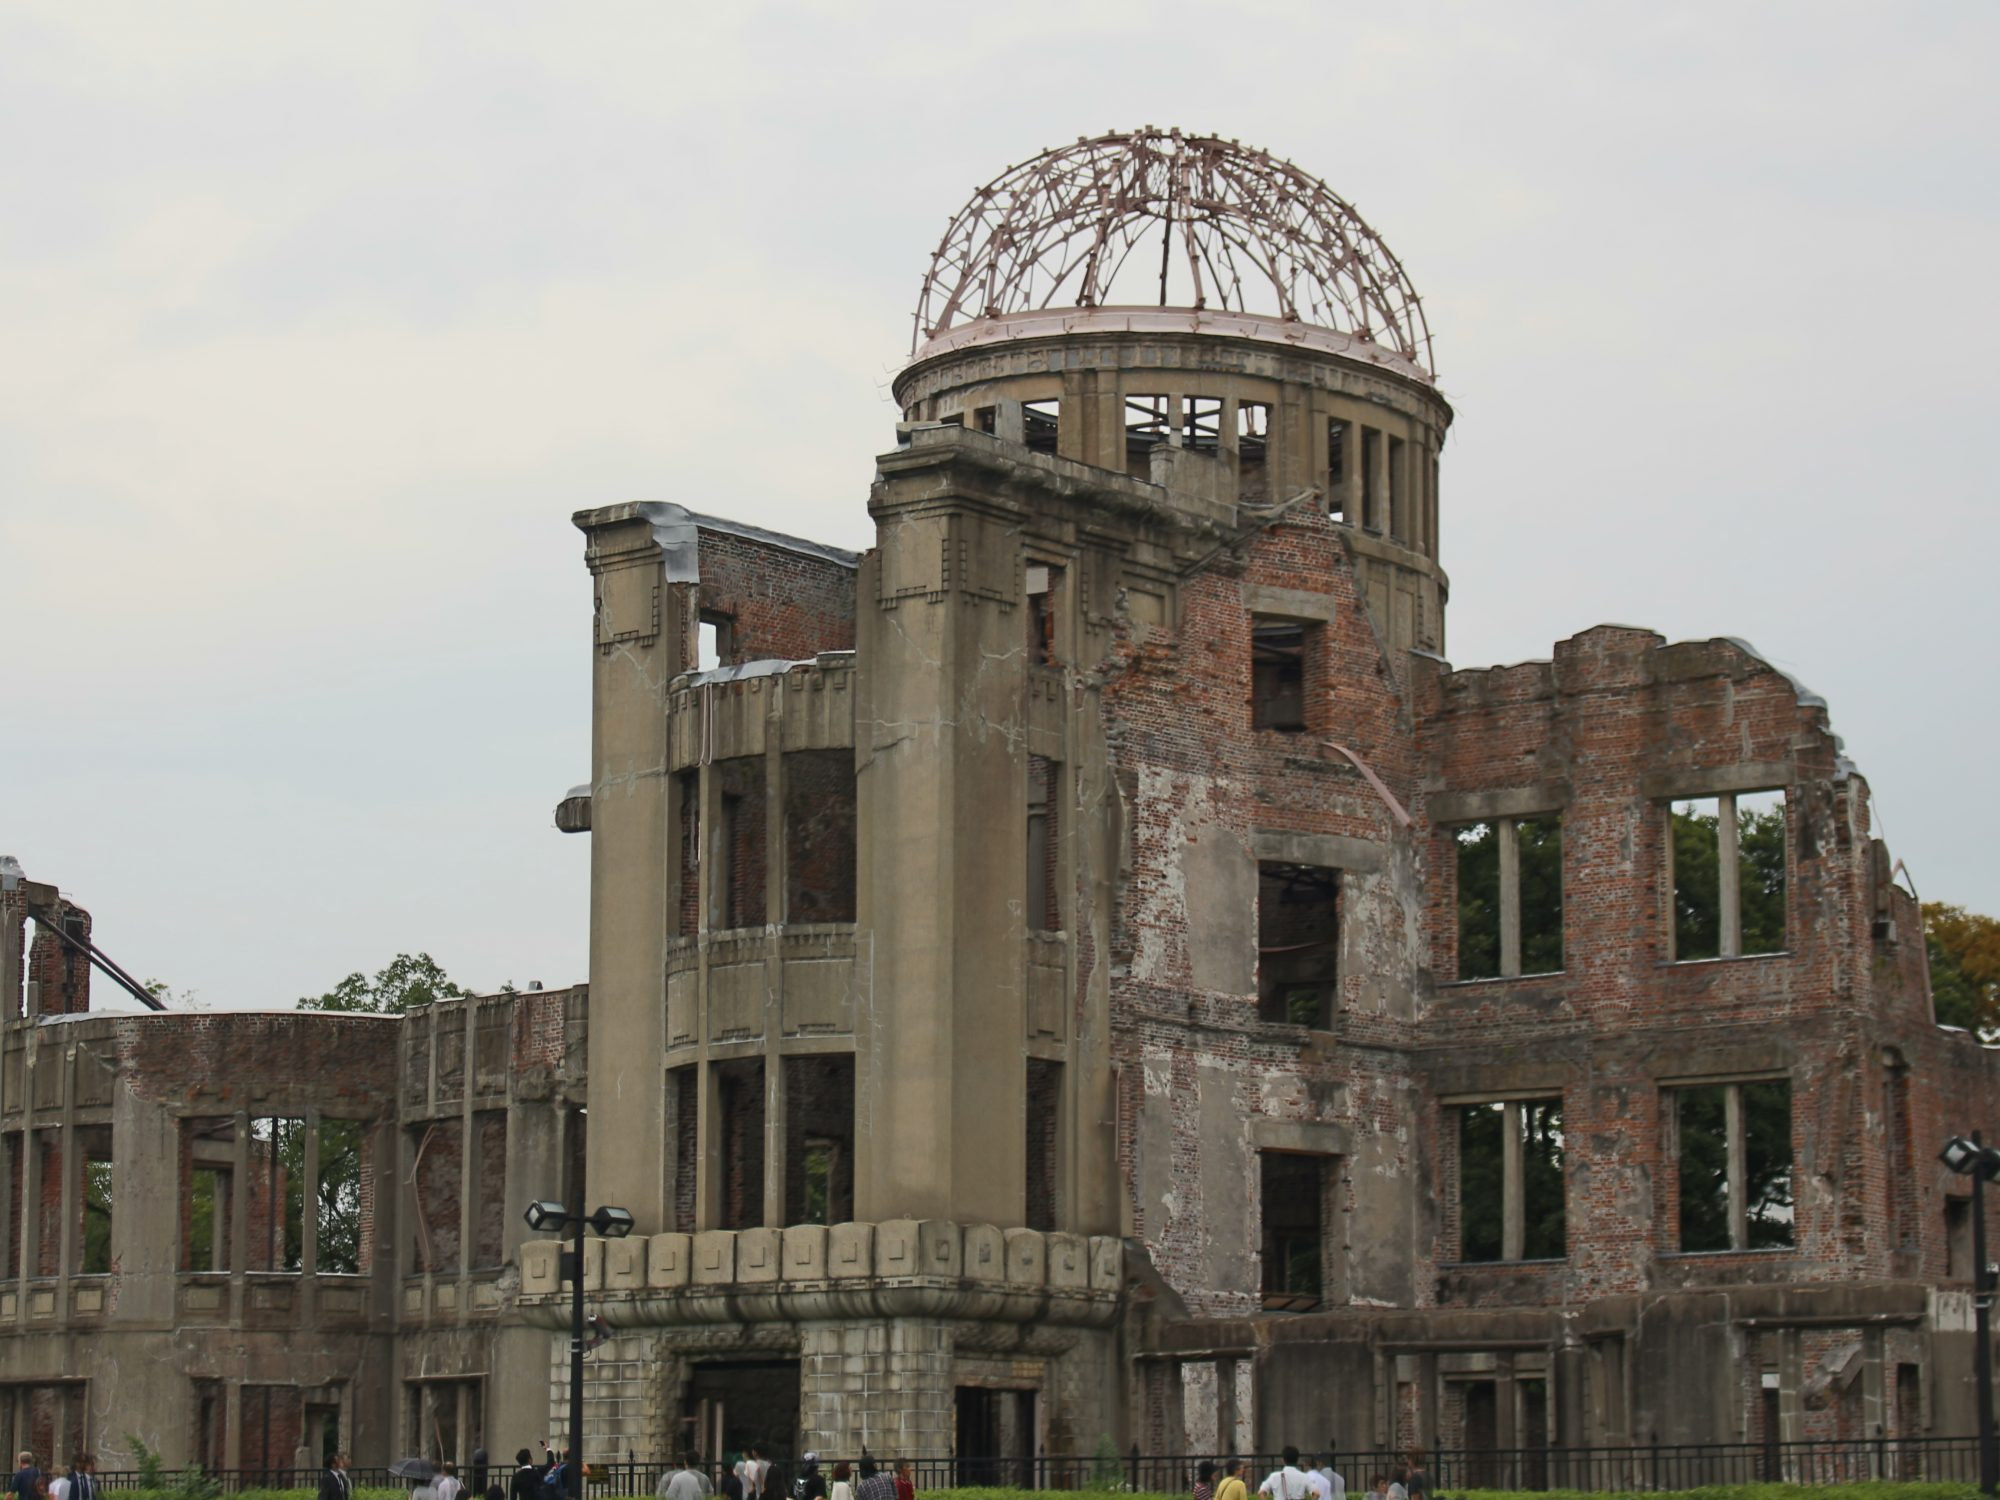 Hiroshima: For World Peace – Jennifer and Harold See the World